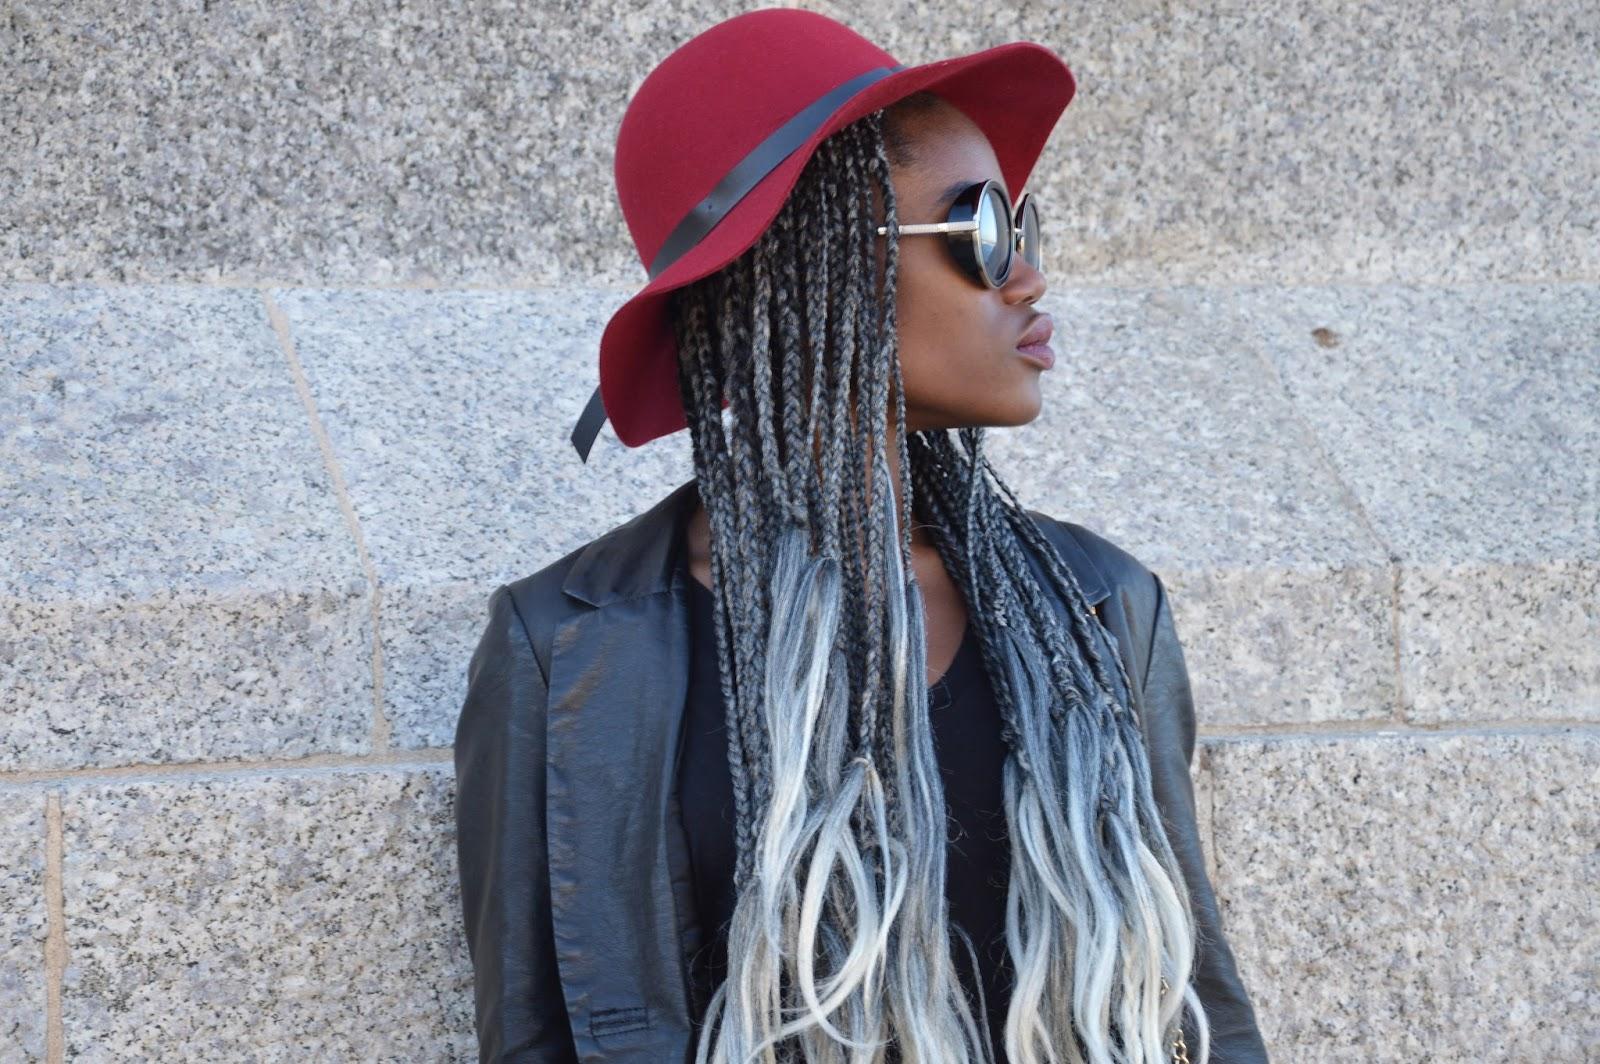 Blog mode afro, blog mode marseille, look, tresses, cheveux gris, idée coiffure afro